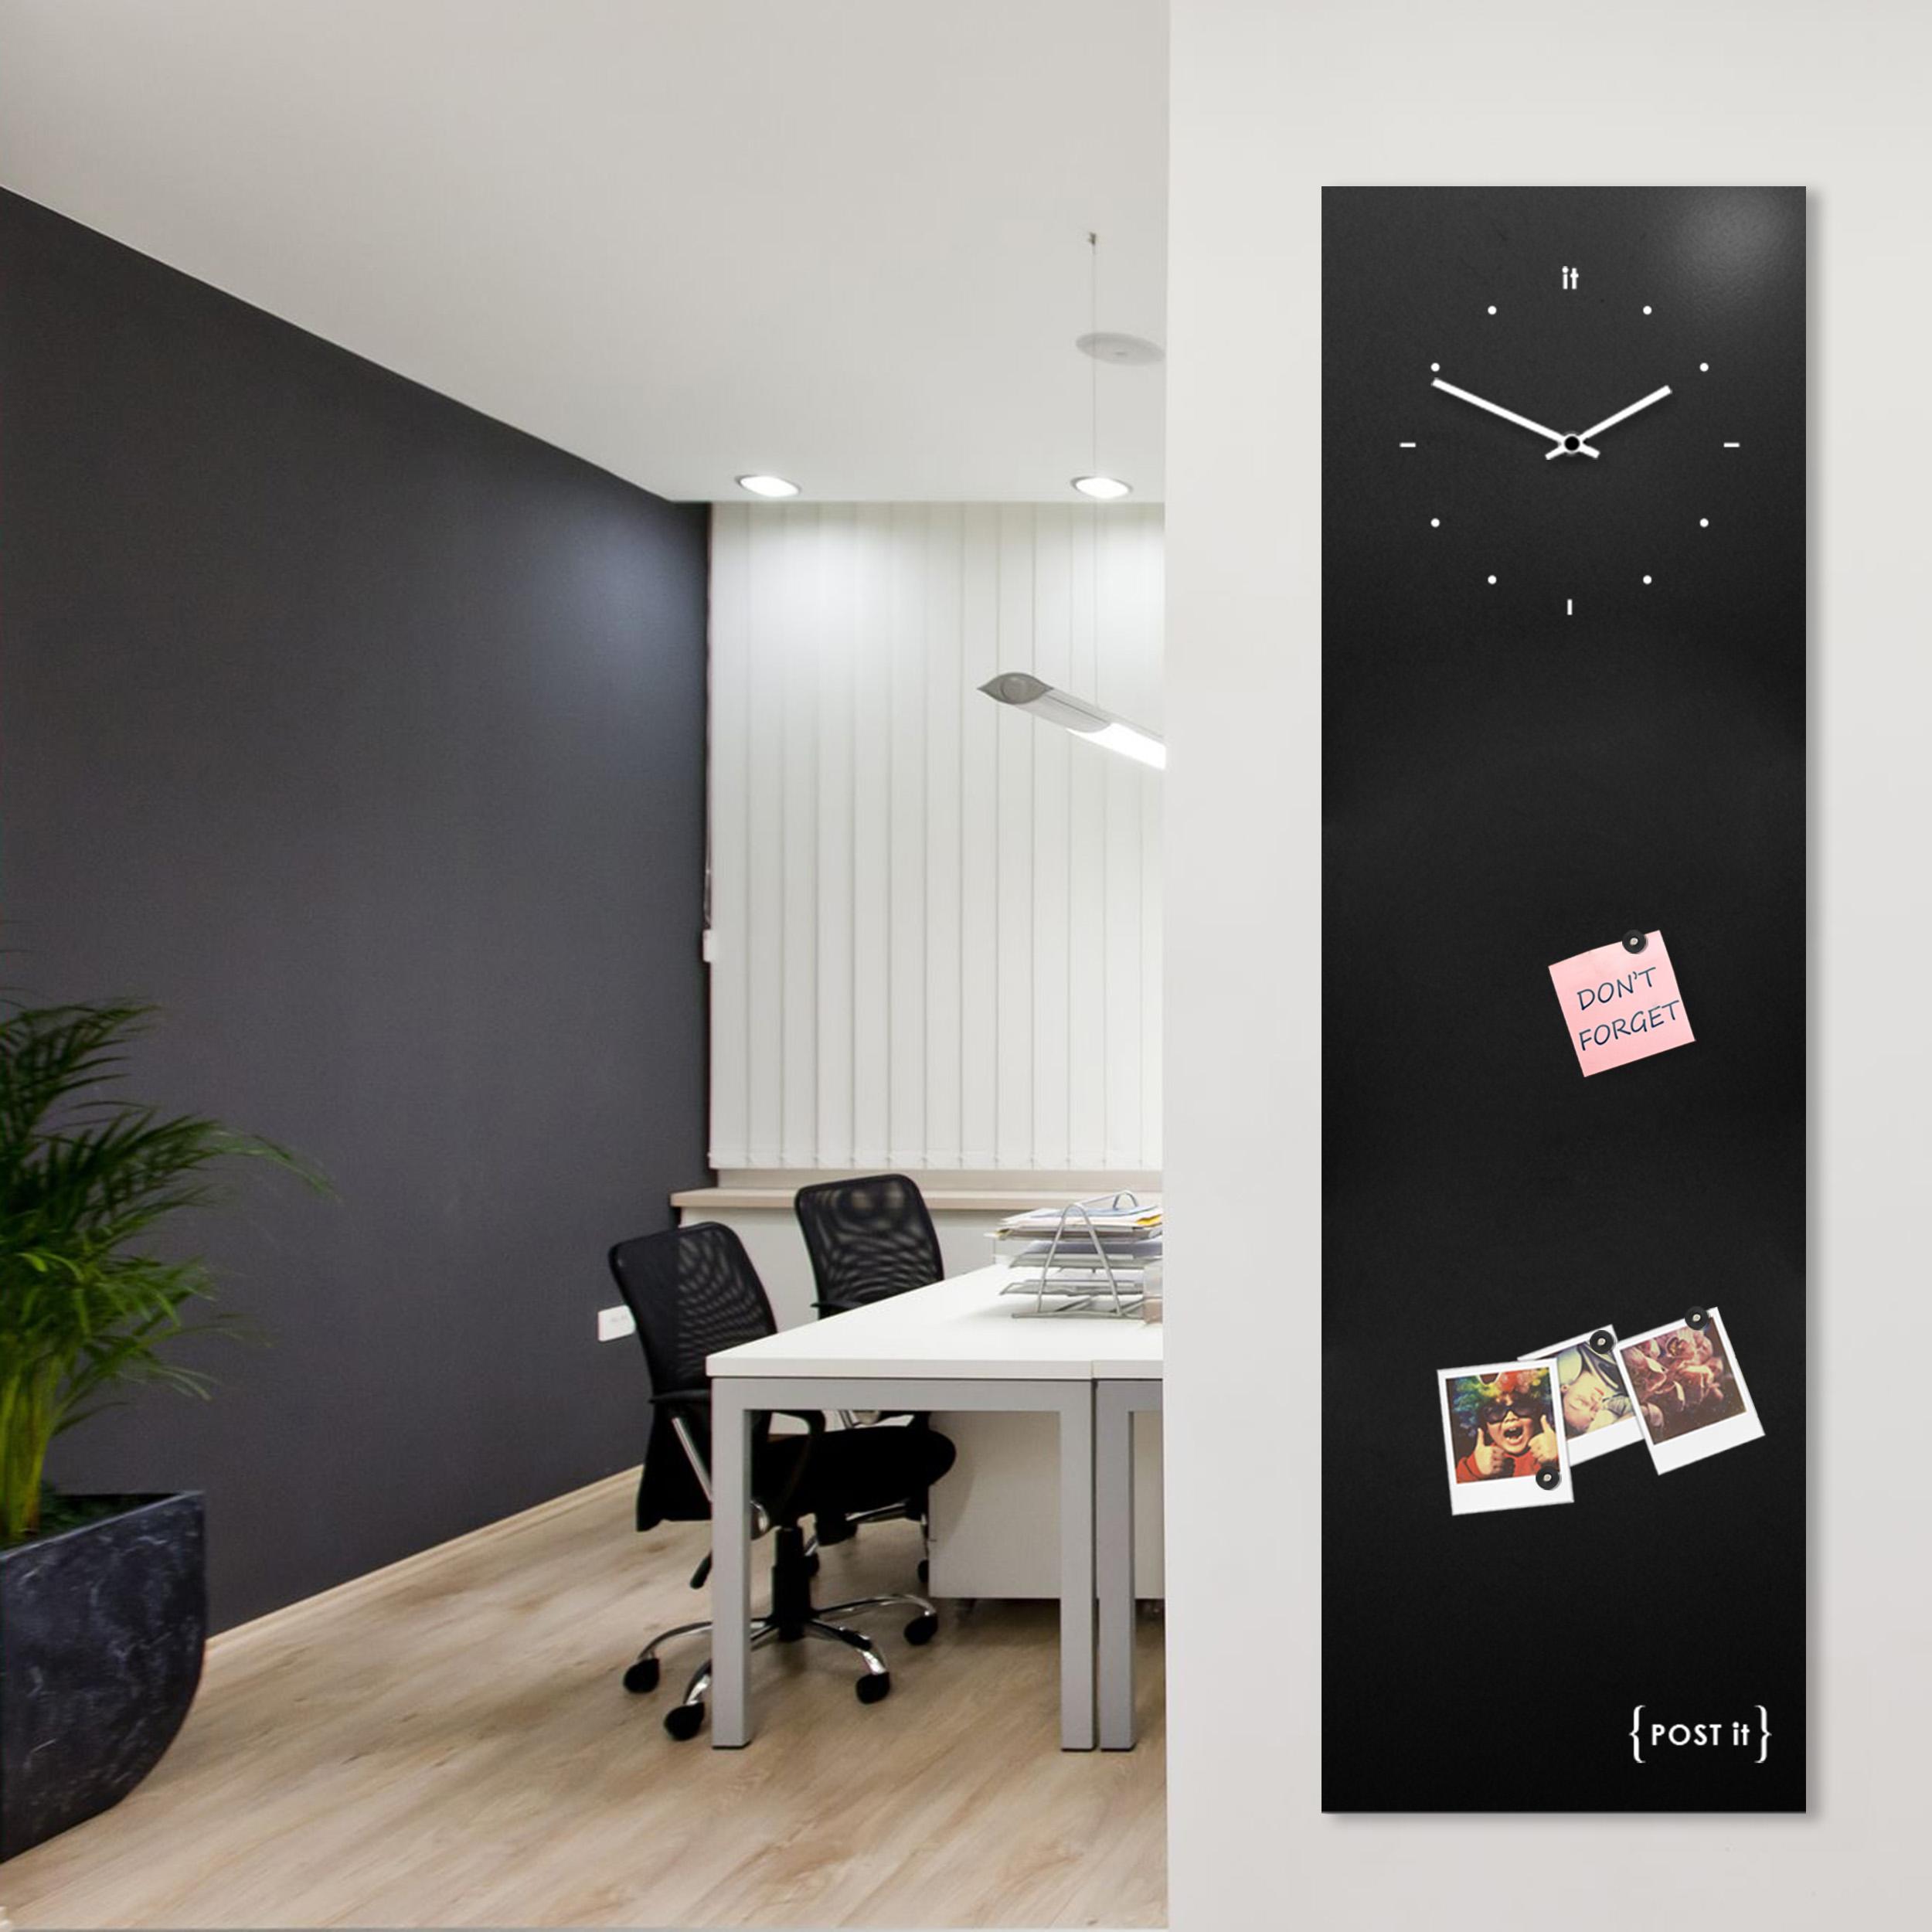 clock-design-magnetic-board-orologio-lavagna-magnetica-post it-black-mood